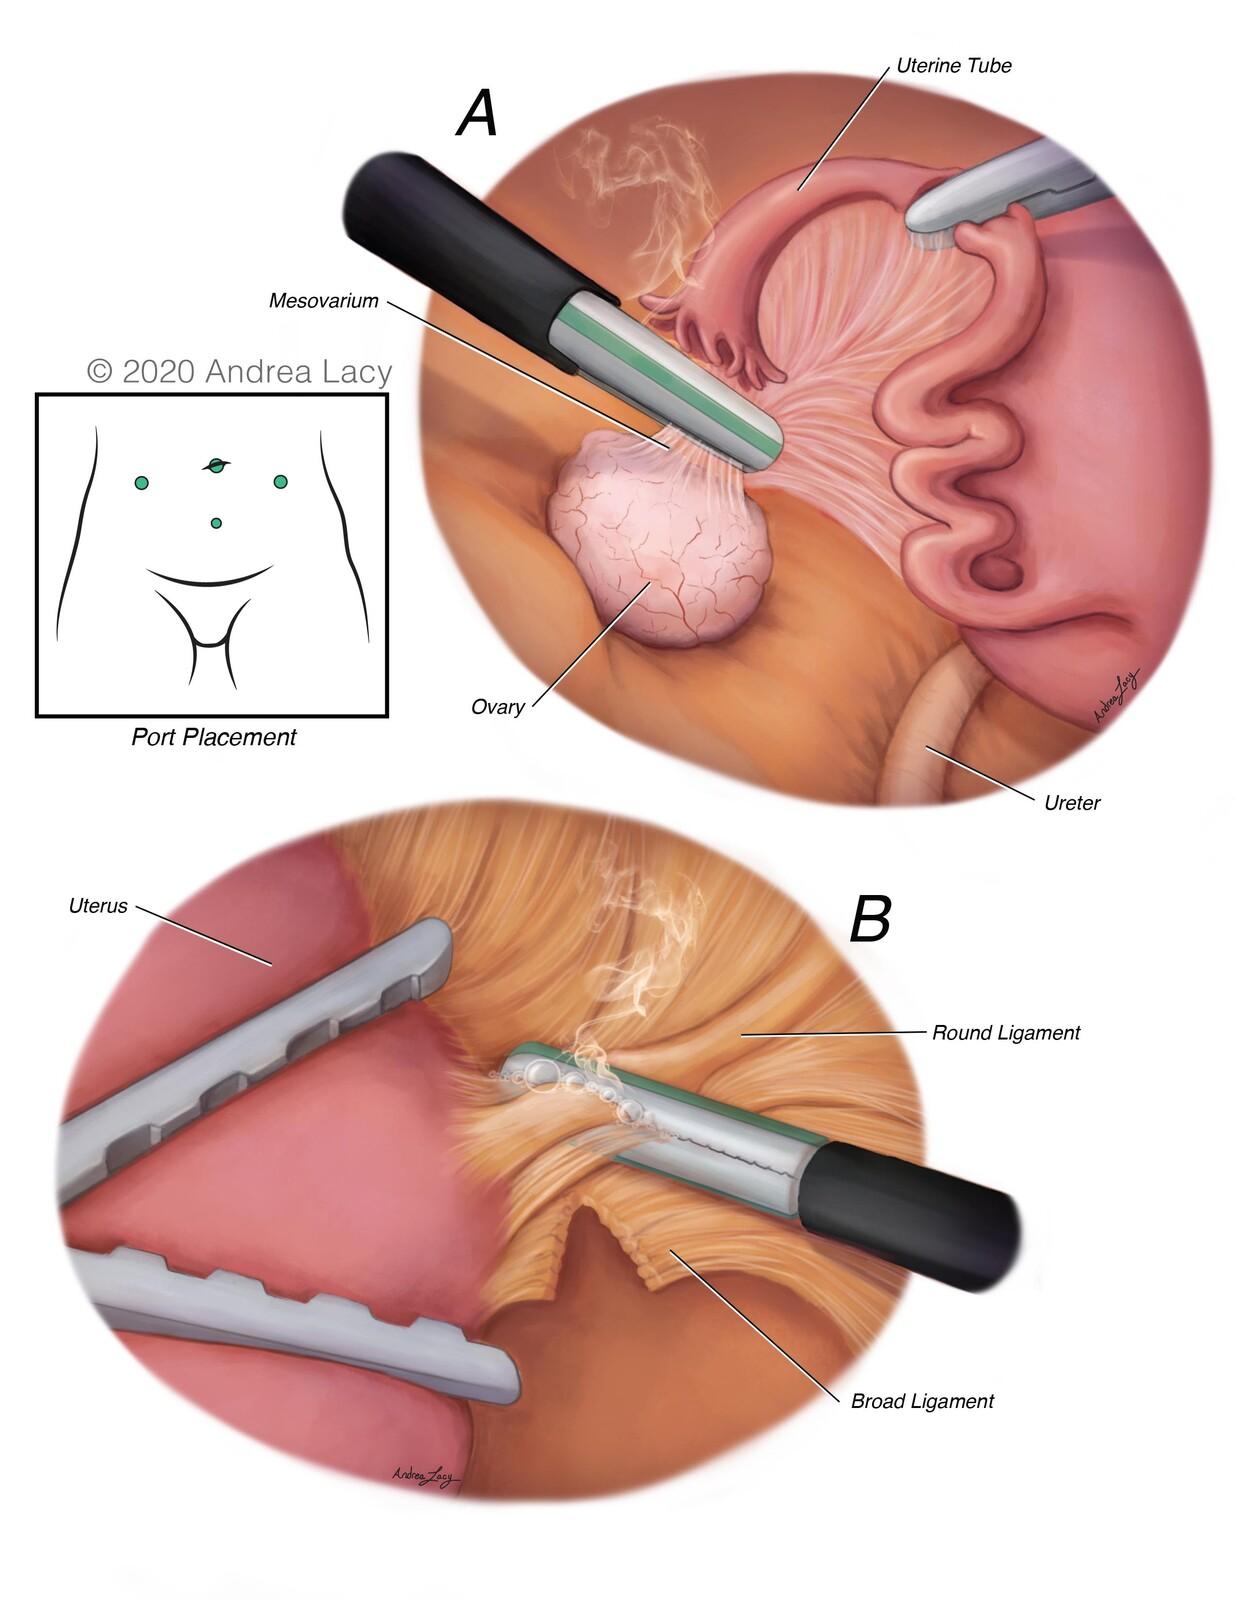 Laparoscopic Hysterectomy-Surgical Series